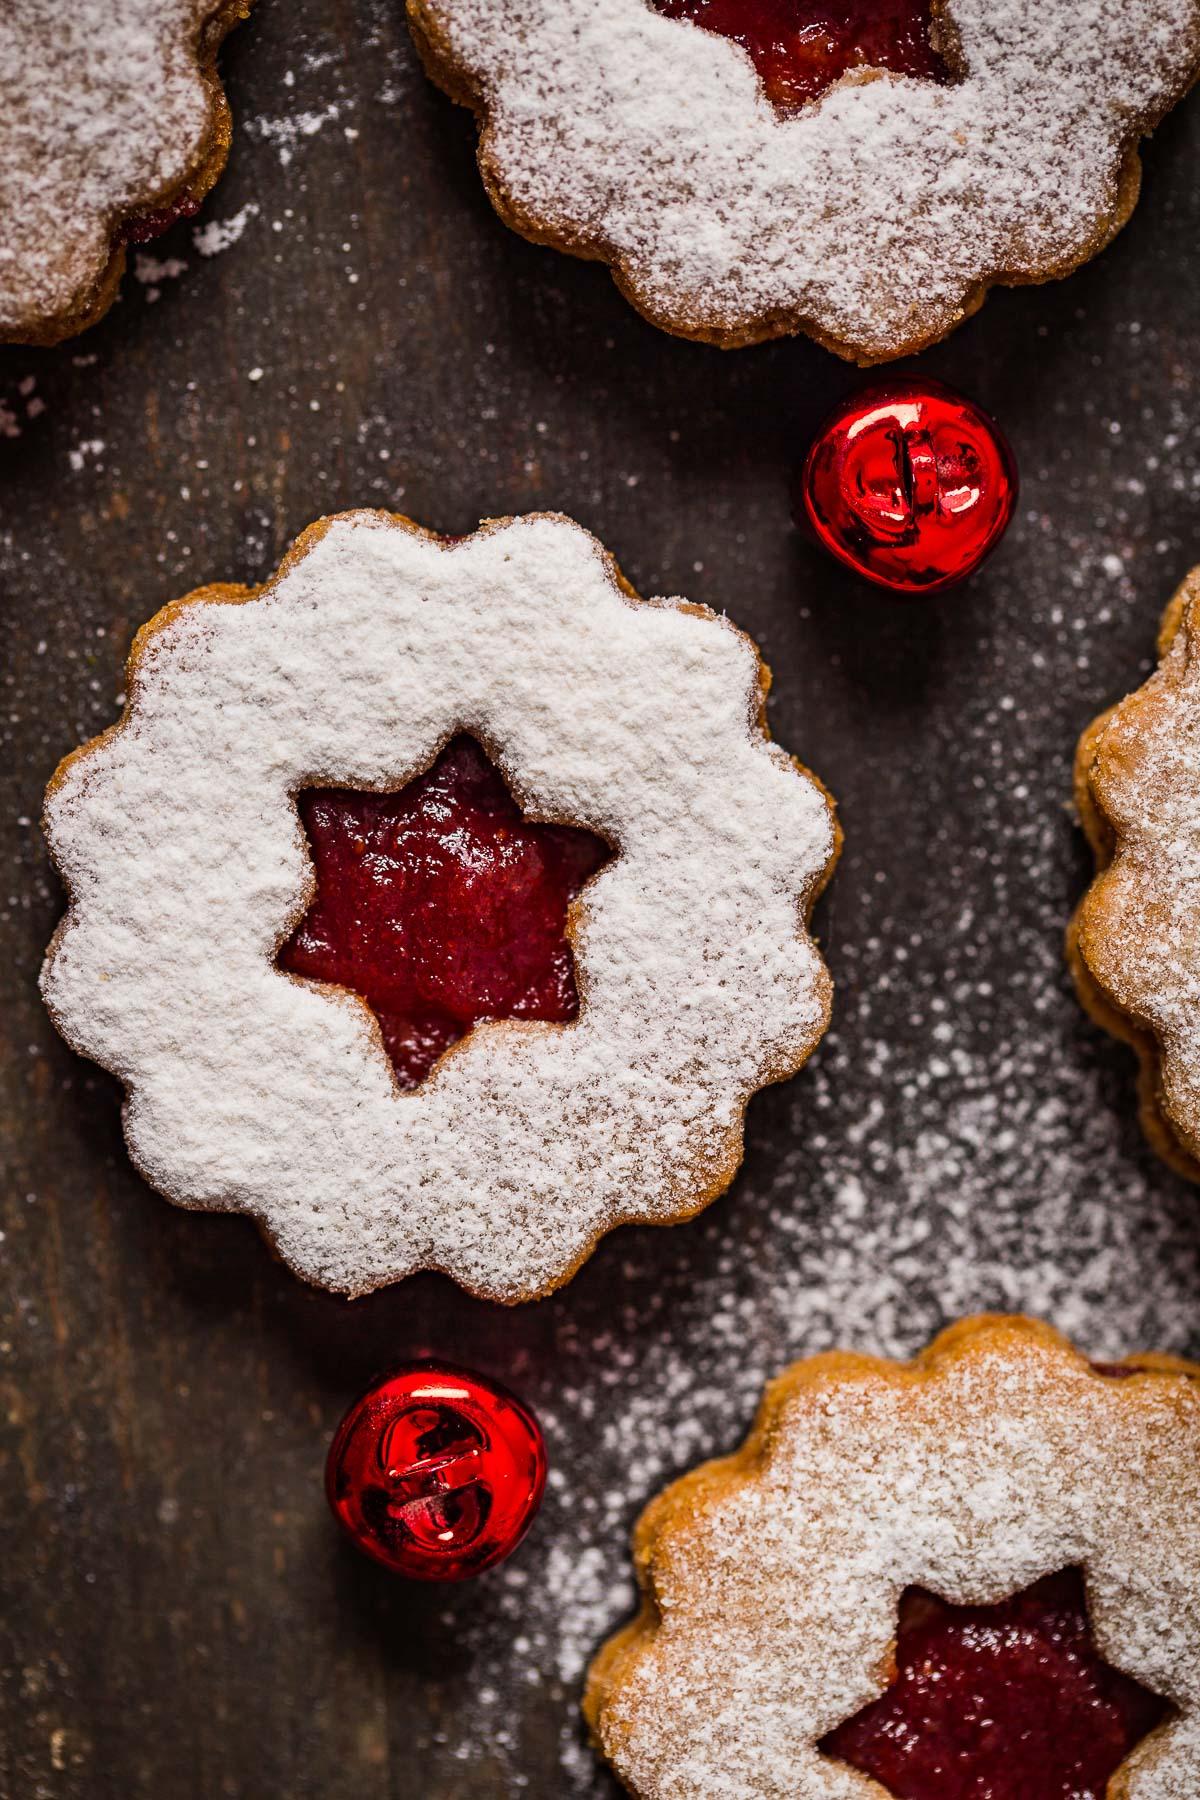 ricetta originale BISCOTTI LINZER VEGANI senza burro senza uova biscotti di Natale -VEGAN LINZER COOKIES original recipe homemade Christmas cookies